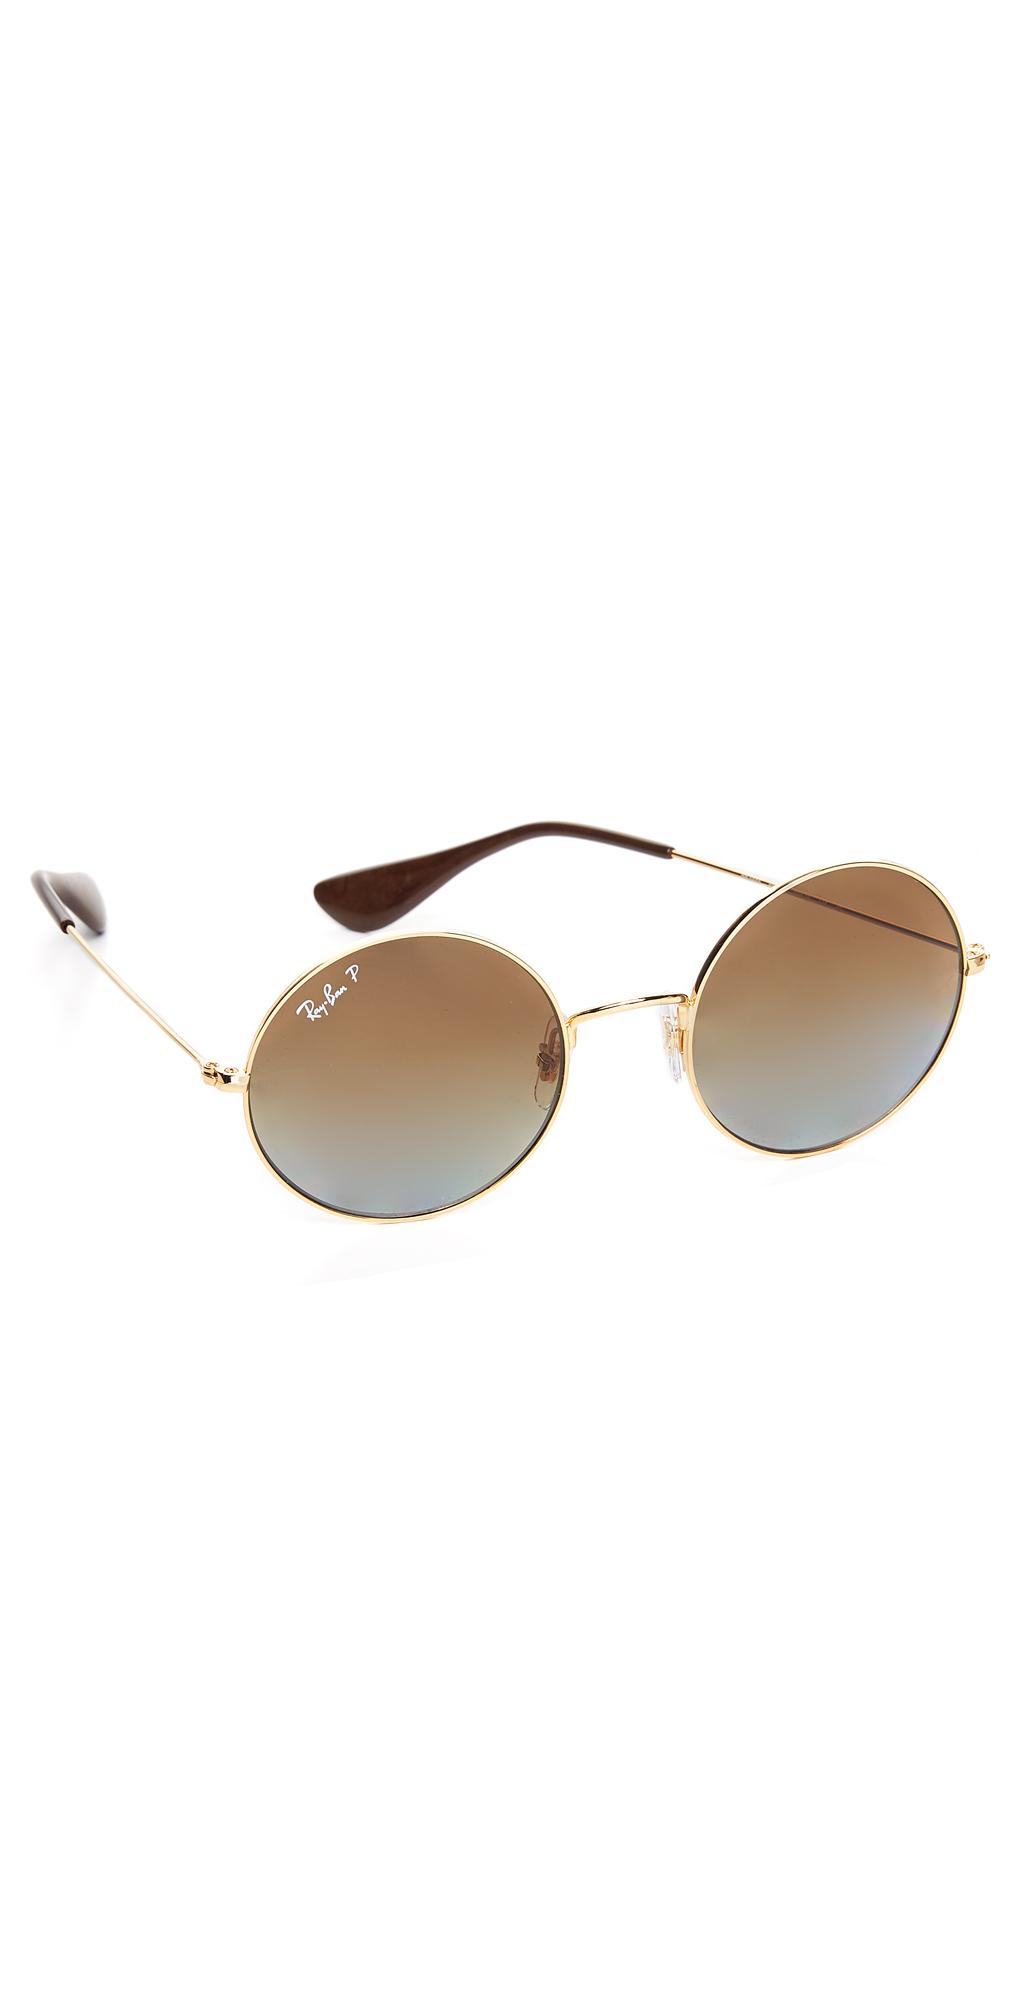 Polarized Round Sunglasses Ray-Ban